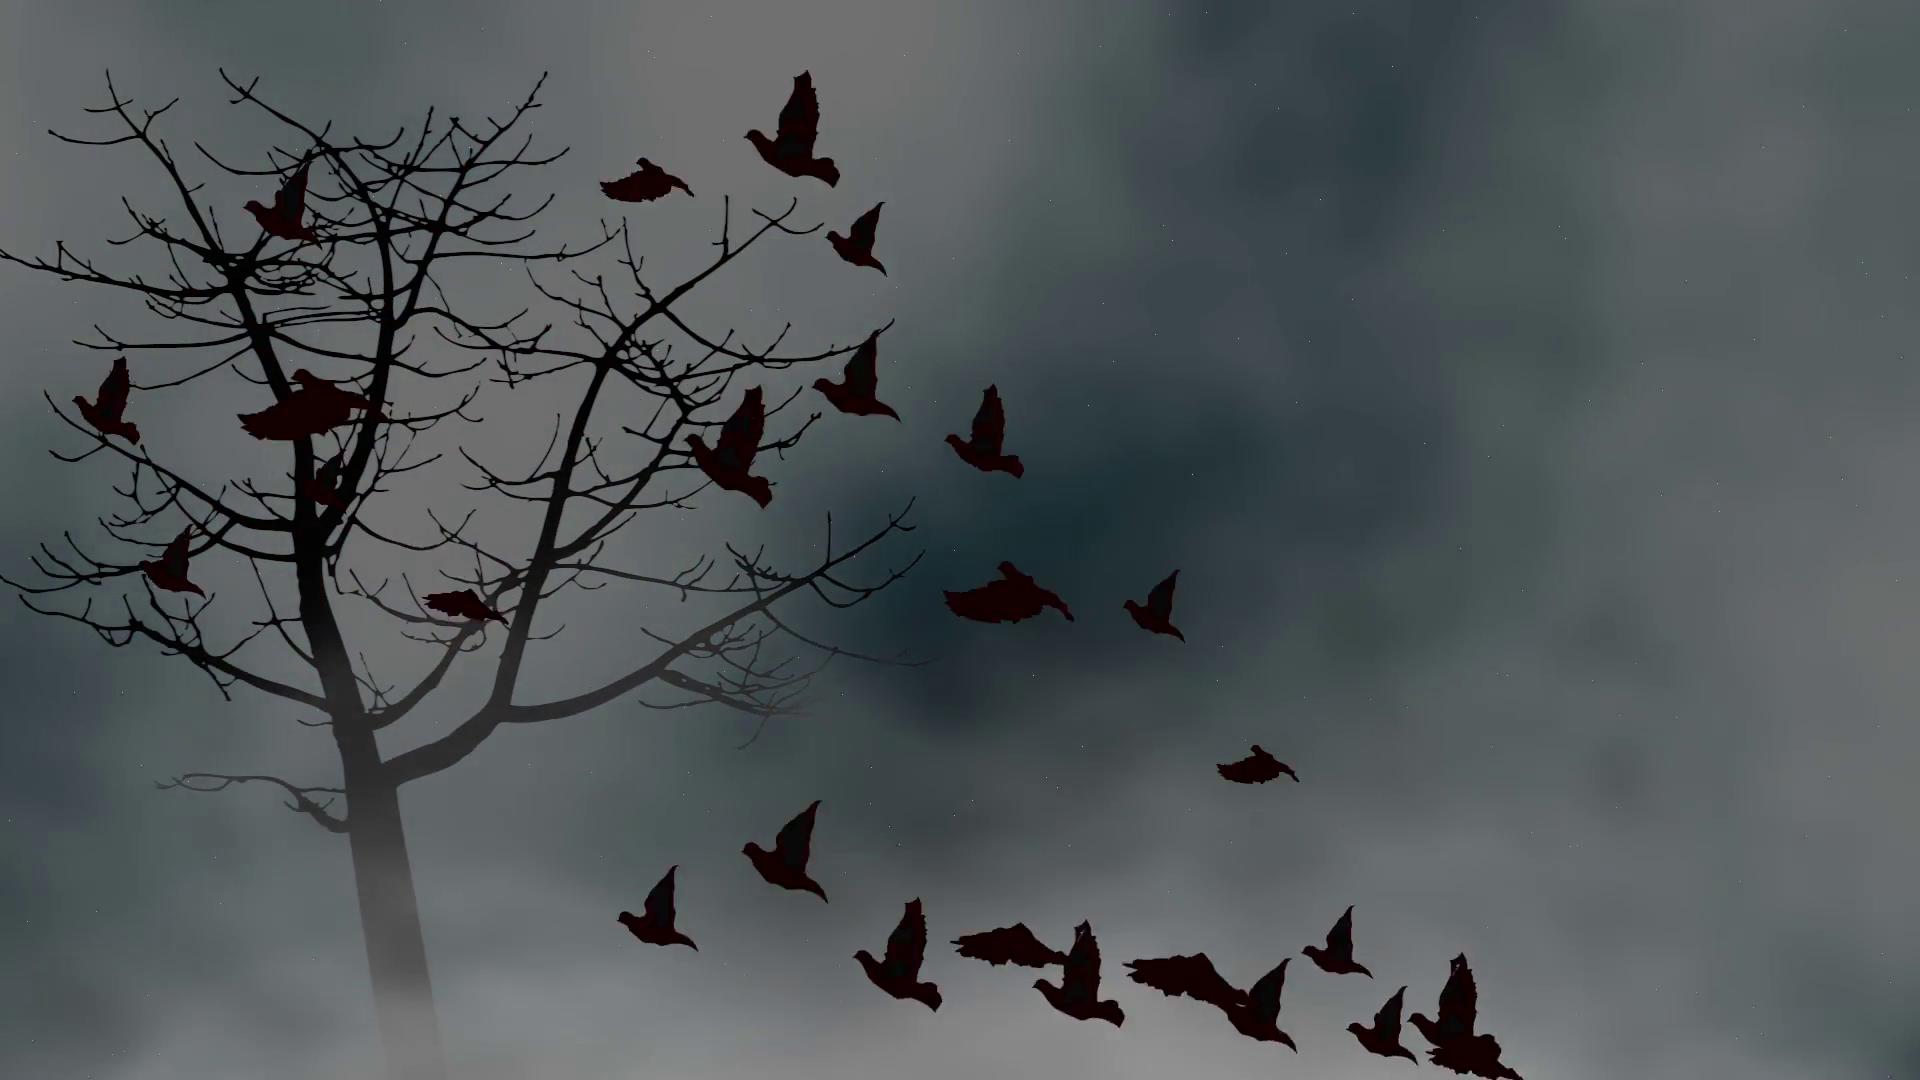 Birds flying into a cloudy sky Motion Background - Videoblocks